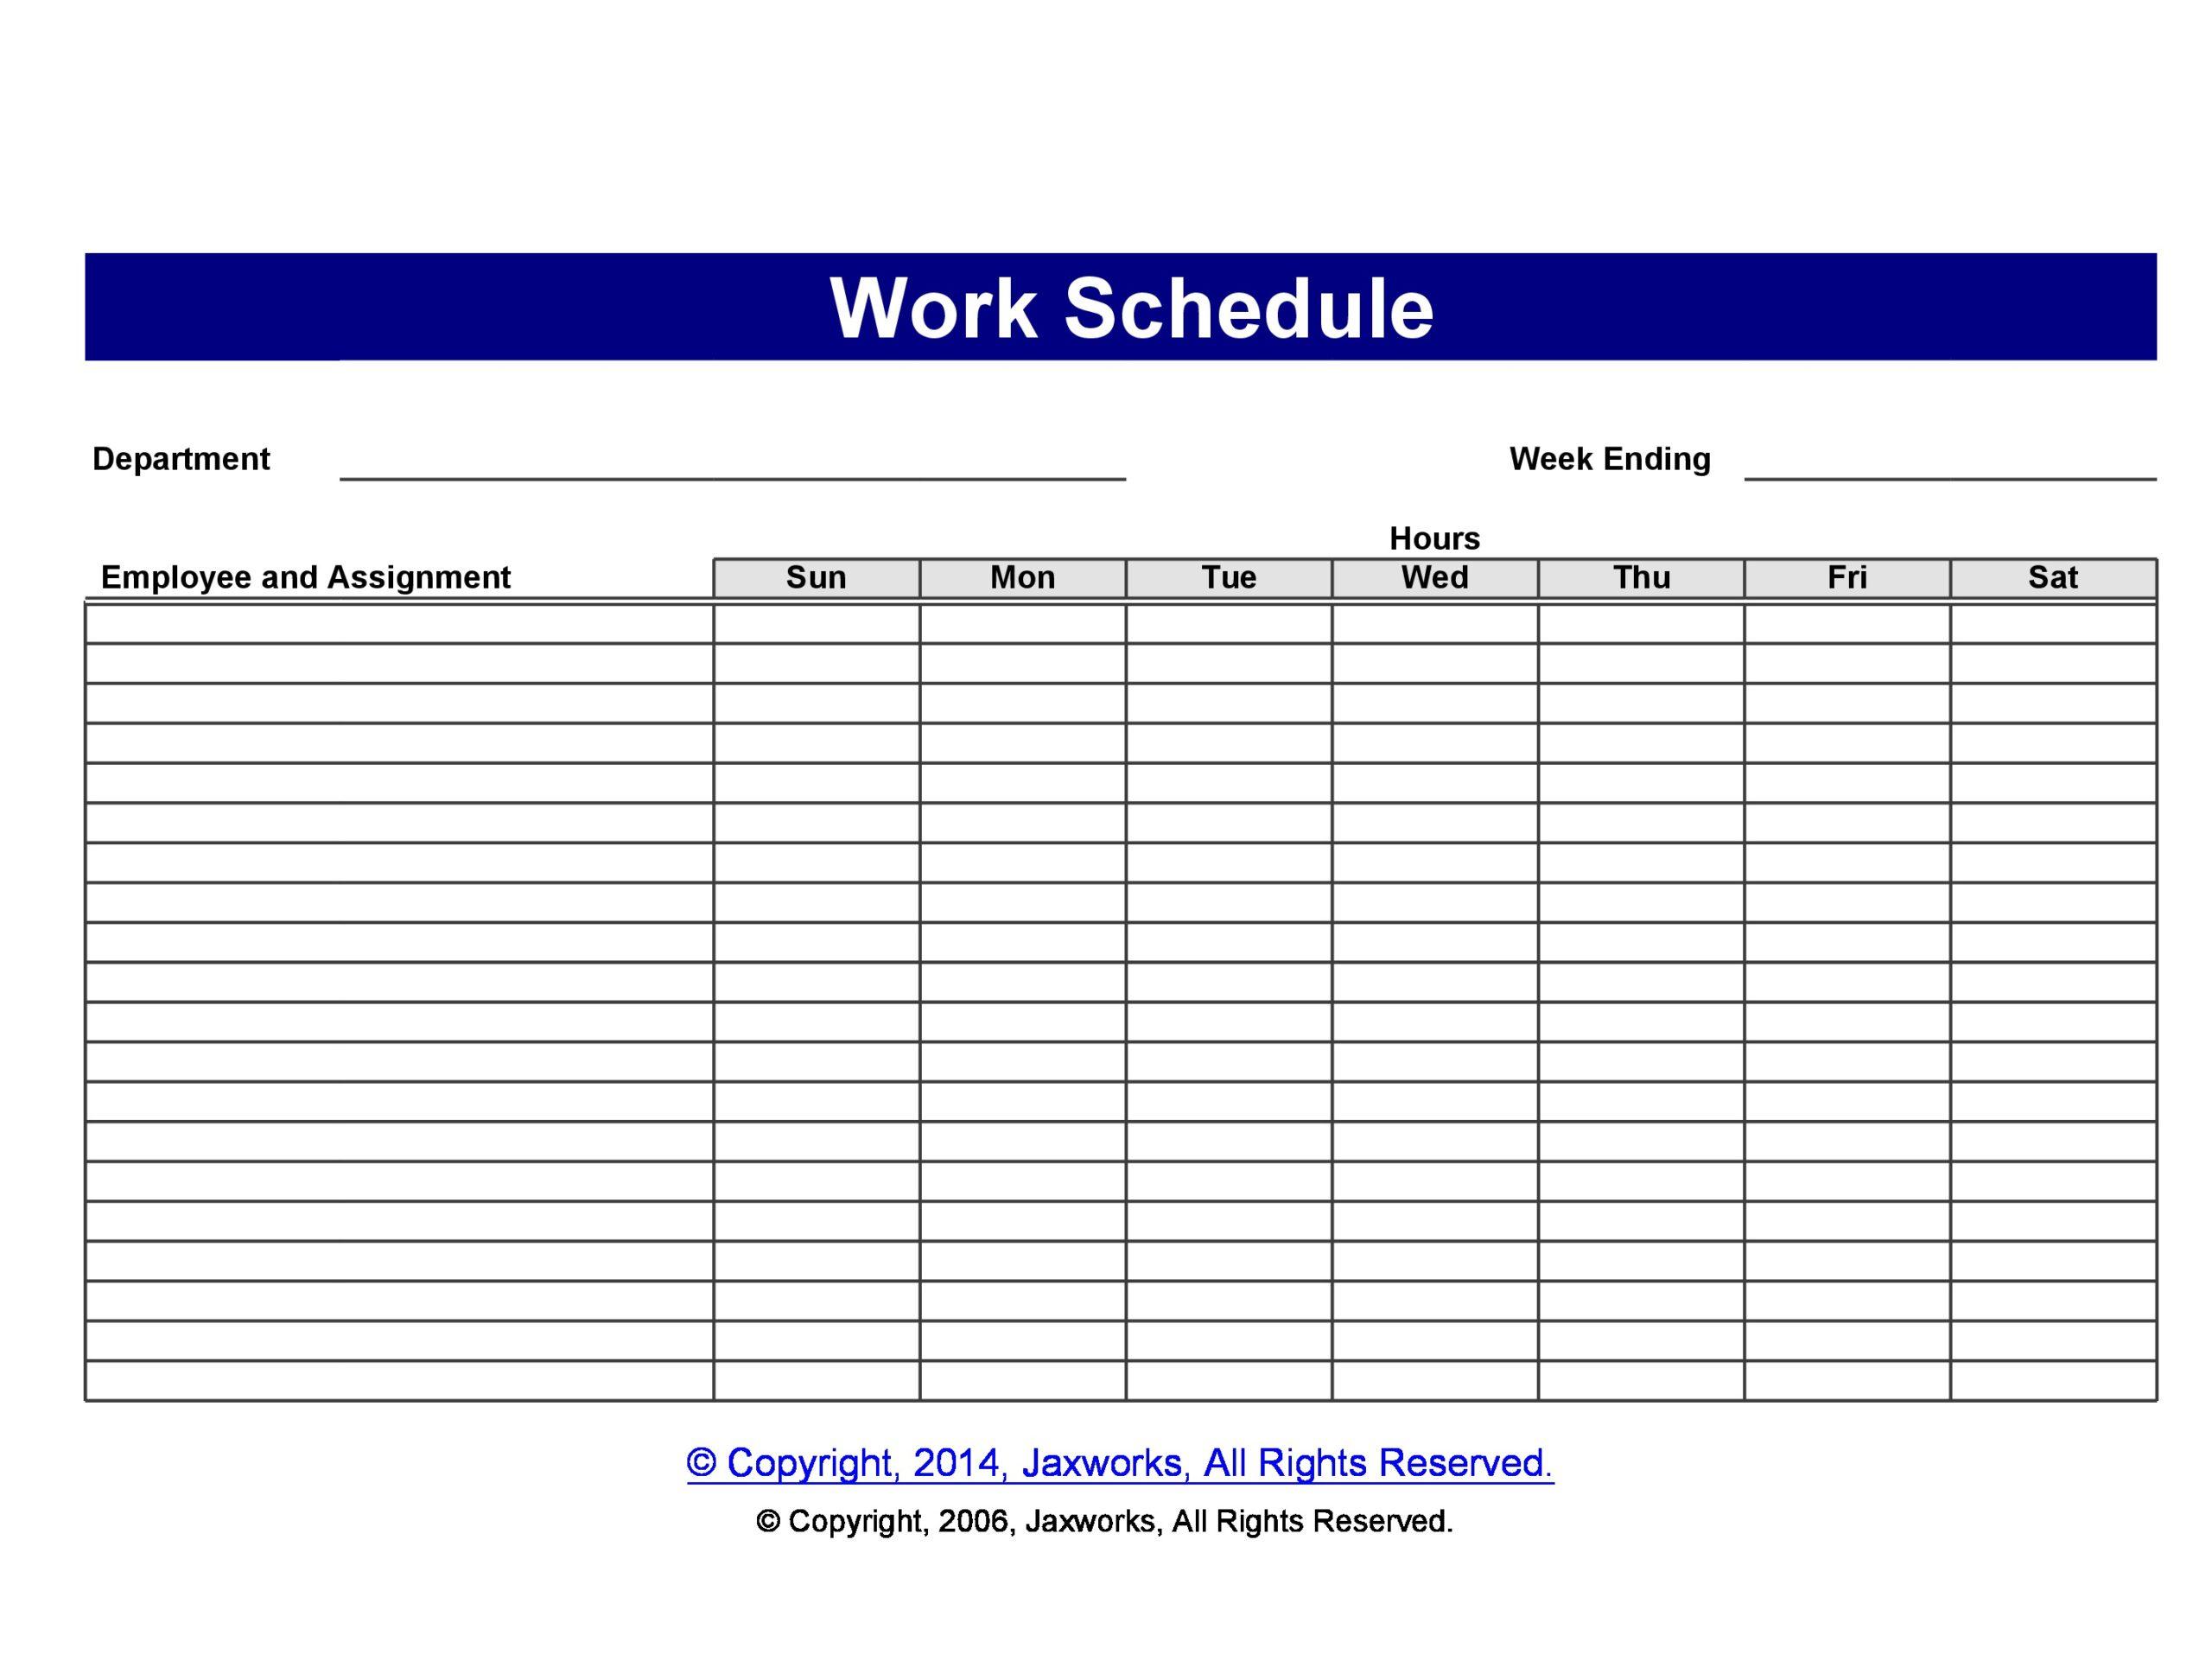 40 Free Employee Schedule Templates (Excel & Word) ᐅ